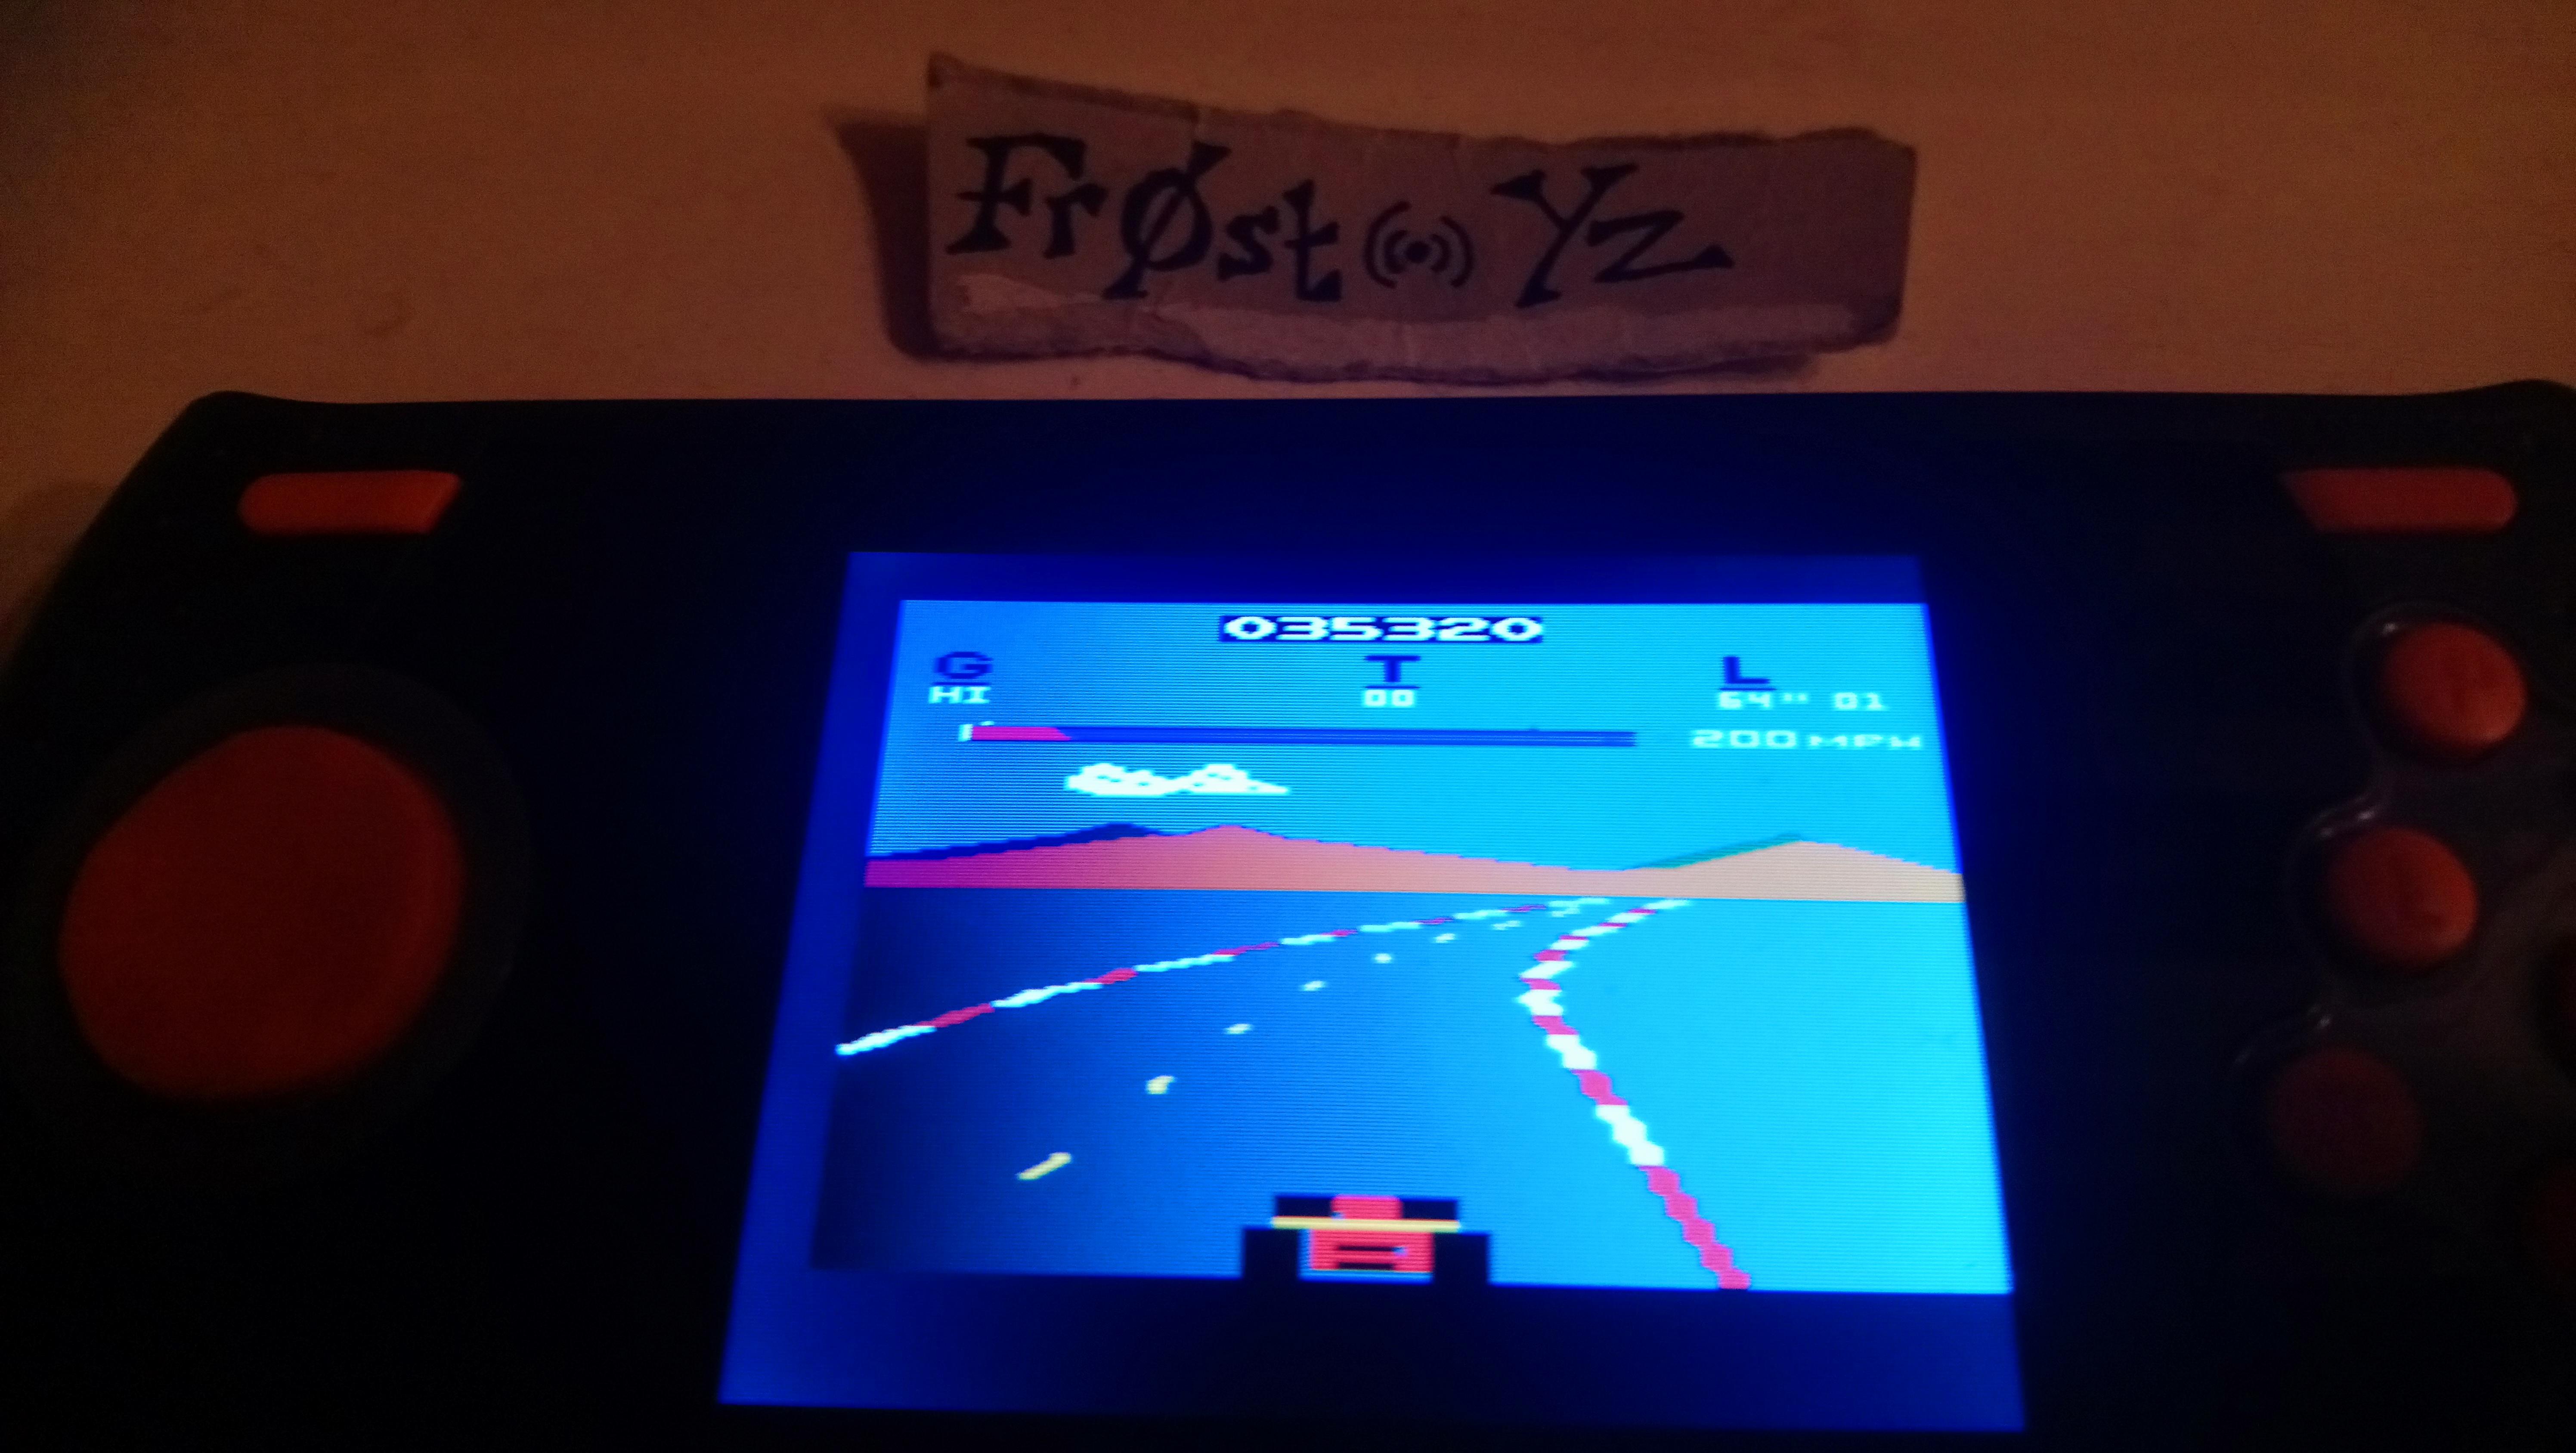 Fr0st: Pole Position (Atari 2600 Emulated) 35,320 points on 2019-02-20 14:44:19